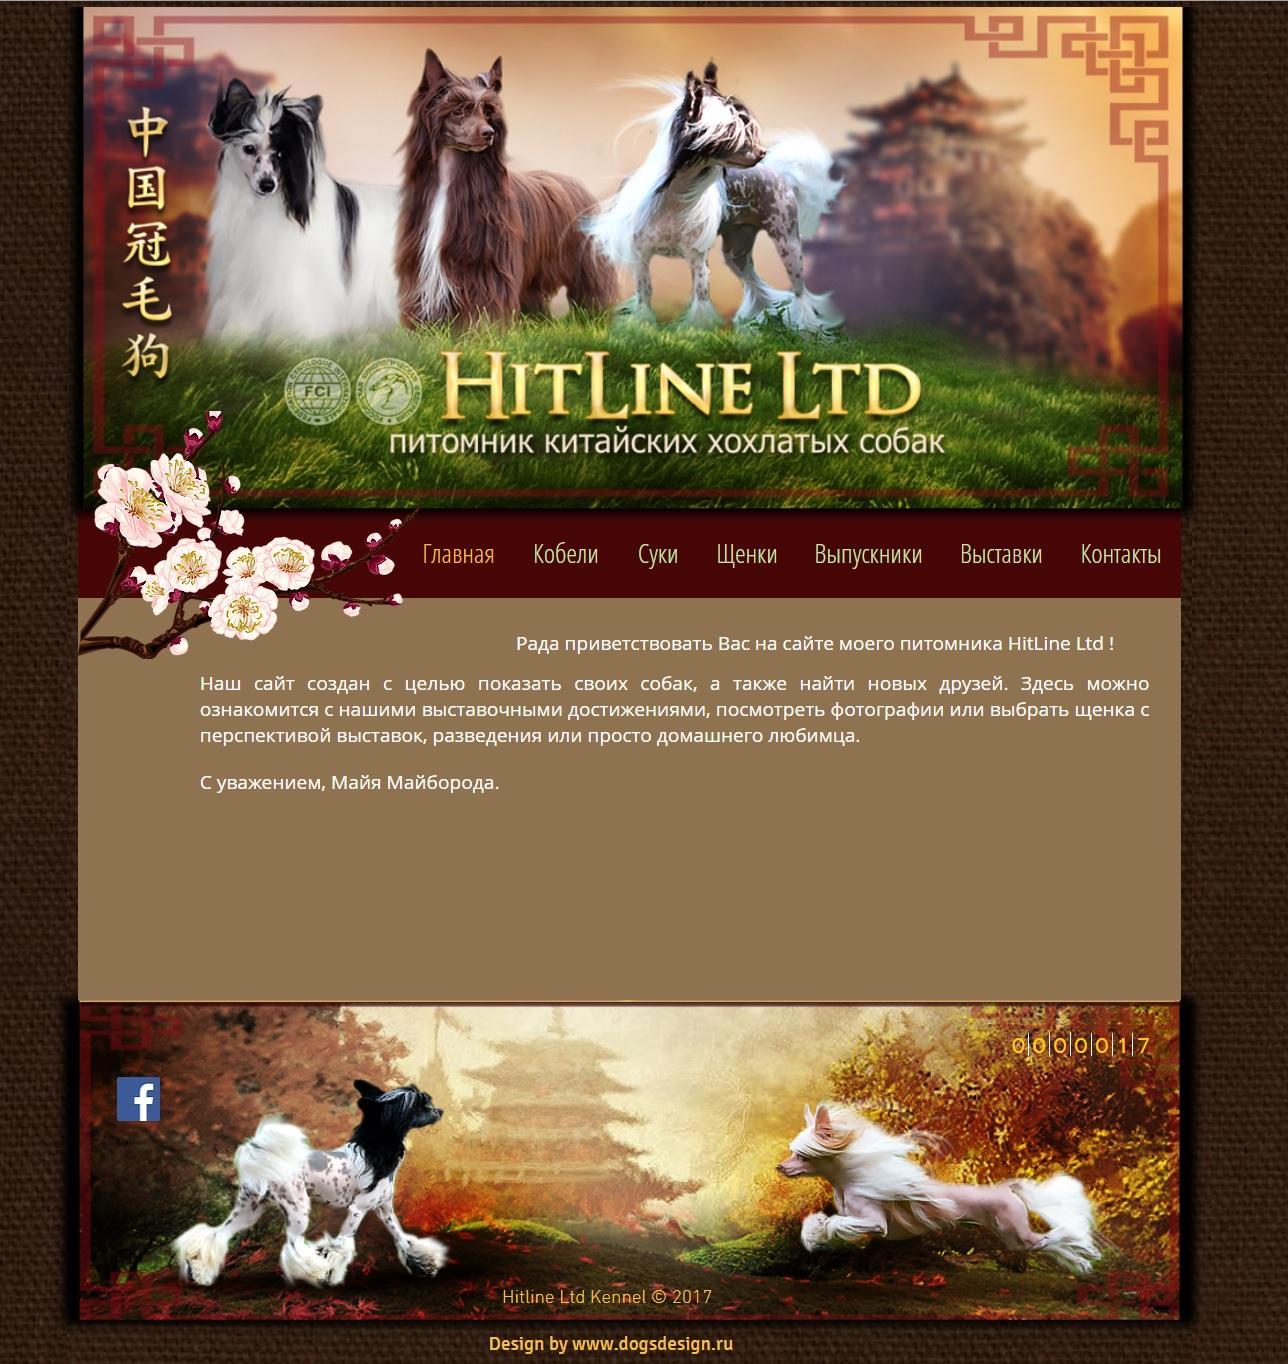 HitLine Ltd